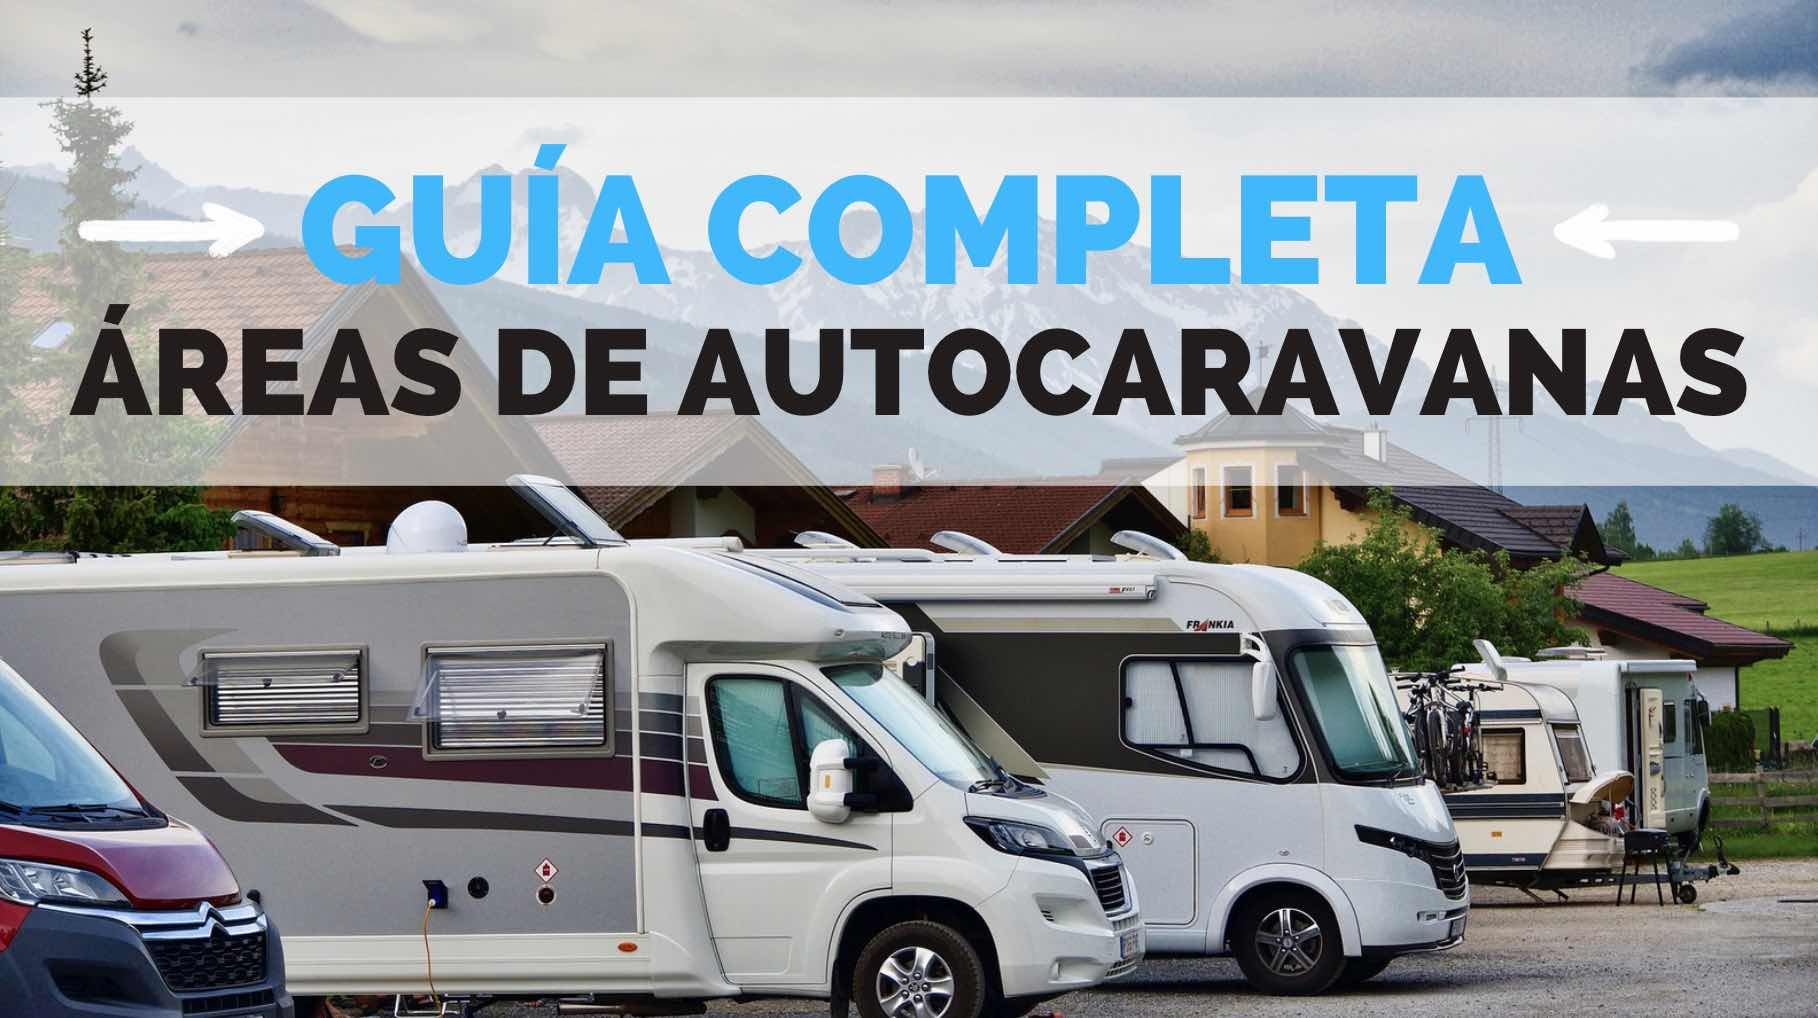 guia mejores areas autocaravanas españa